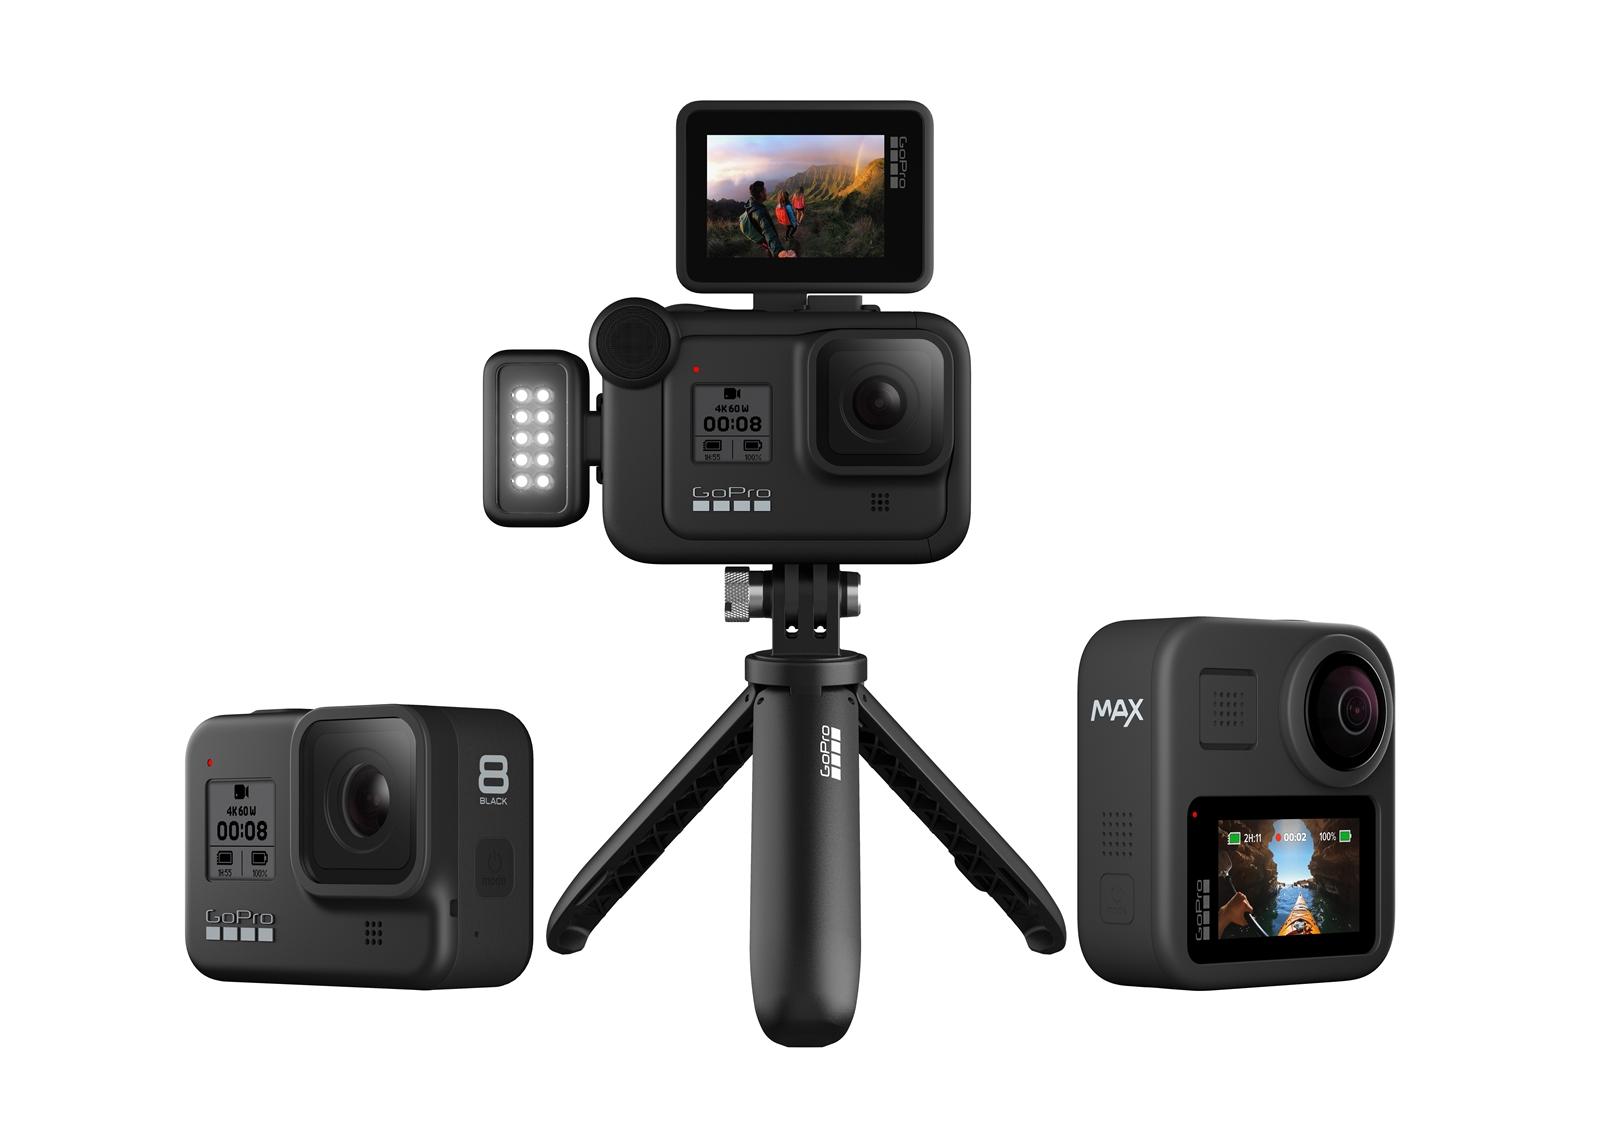 GoPro เปิดตัว GoPro HERO8 BLACK (14,500 บาท), Mods และ GoPro MAX (17,000 บาท)